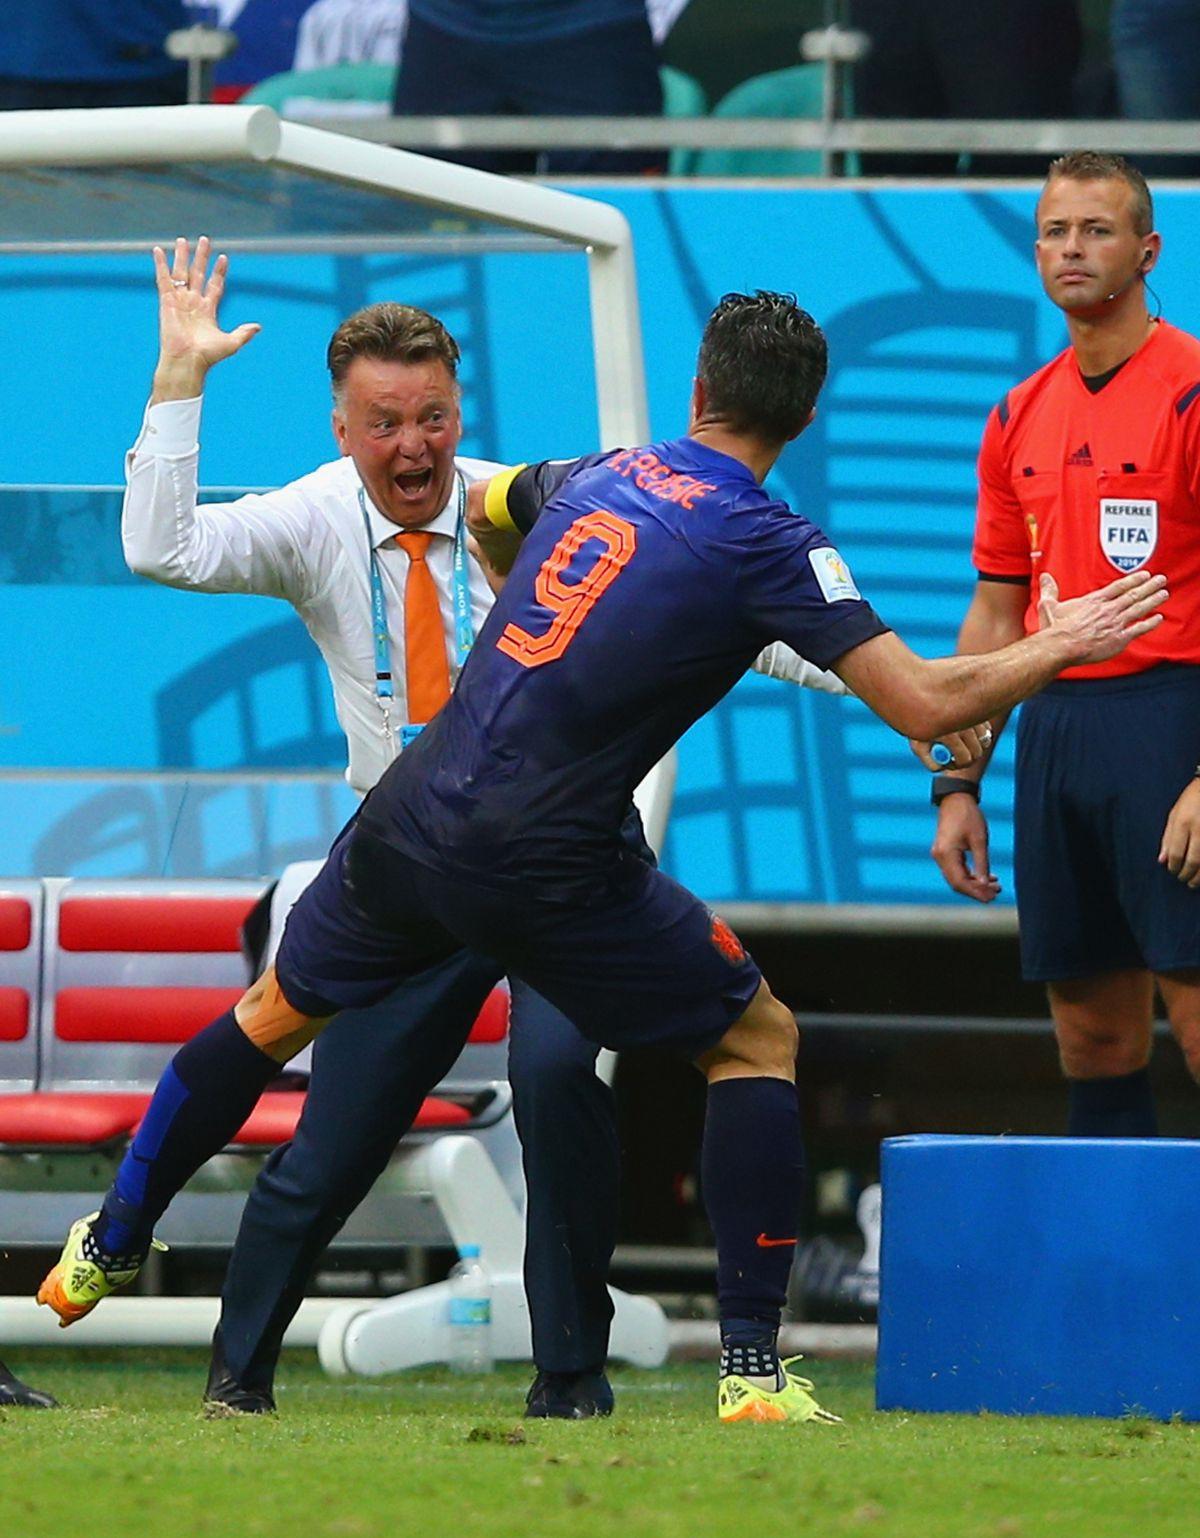 Spain v Netherlands: Group B - 2014 FIFA World Cup Brazil